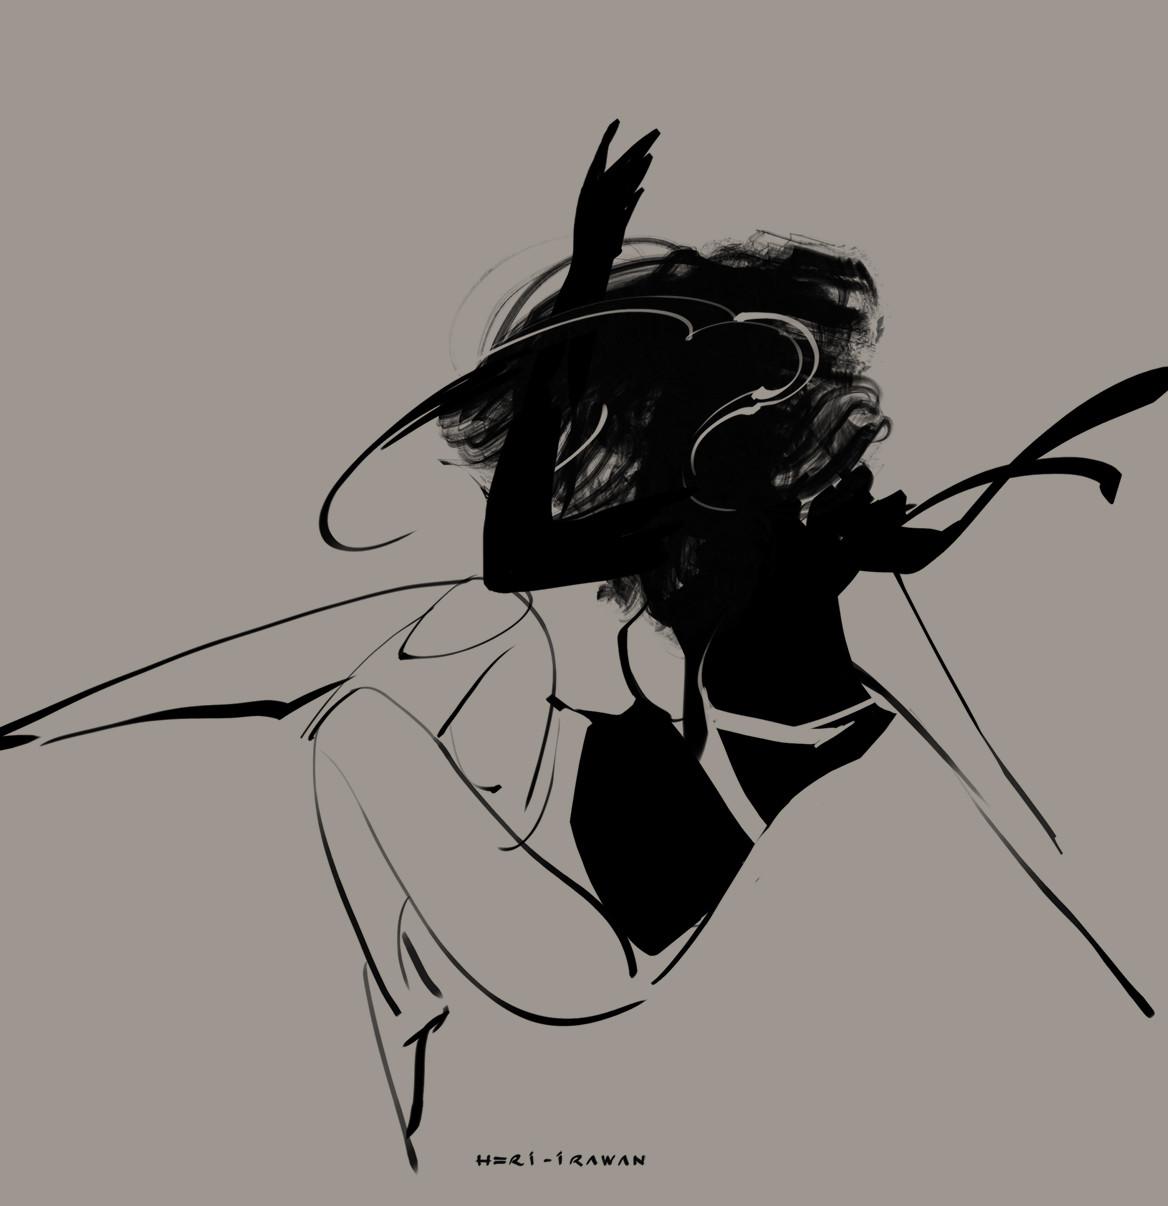 Heri irawan sketch 20170904 c